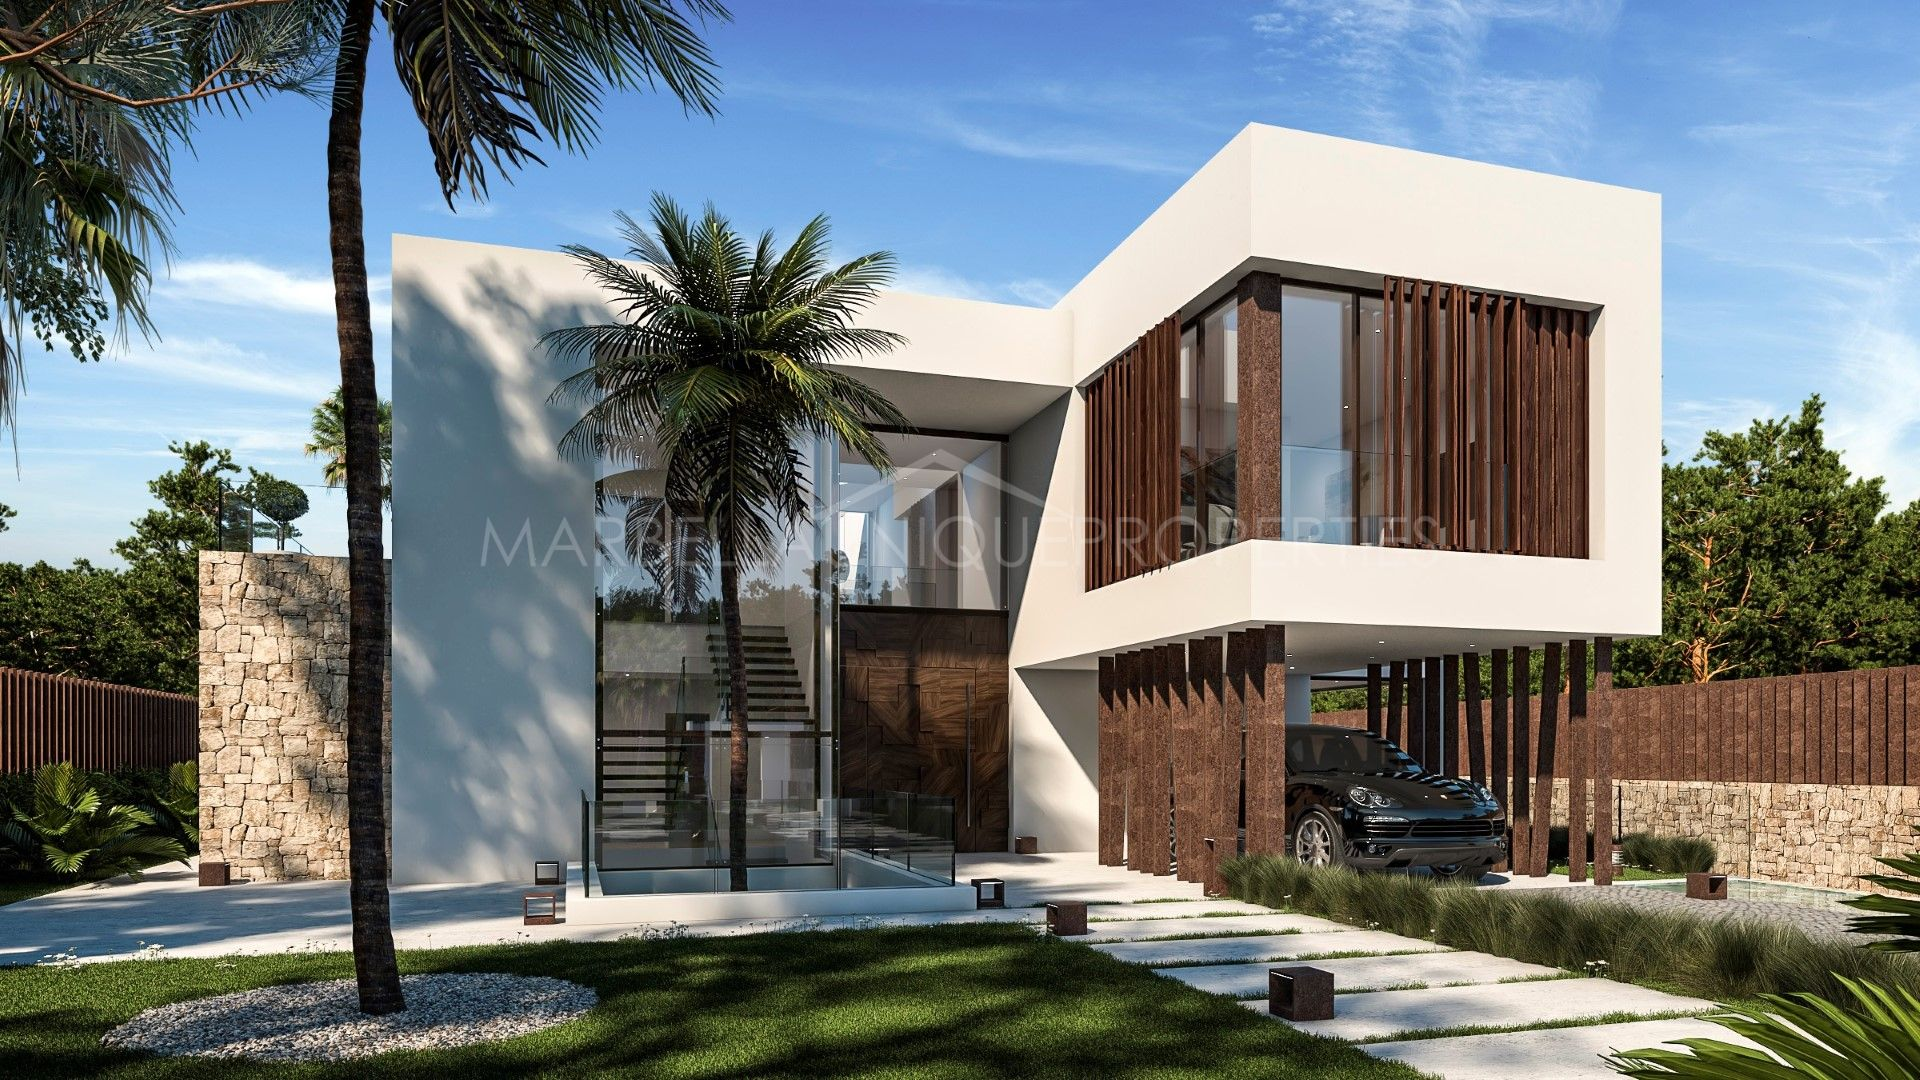 Modern villa for sale in the exclusive area of guadalmina baja